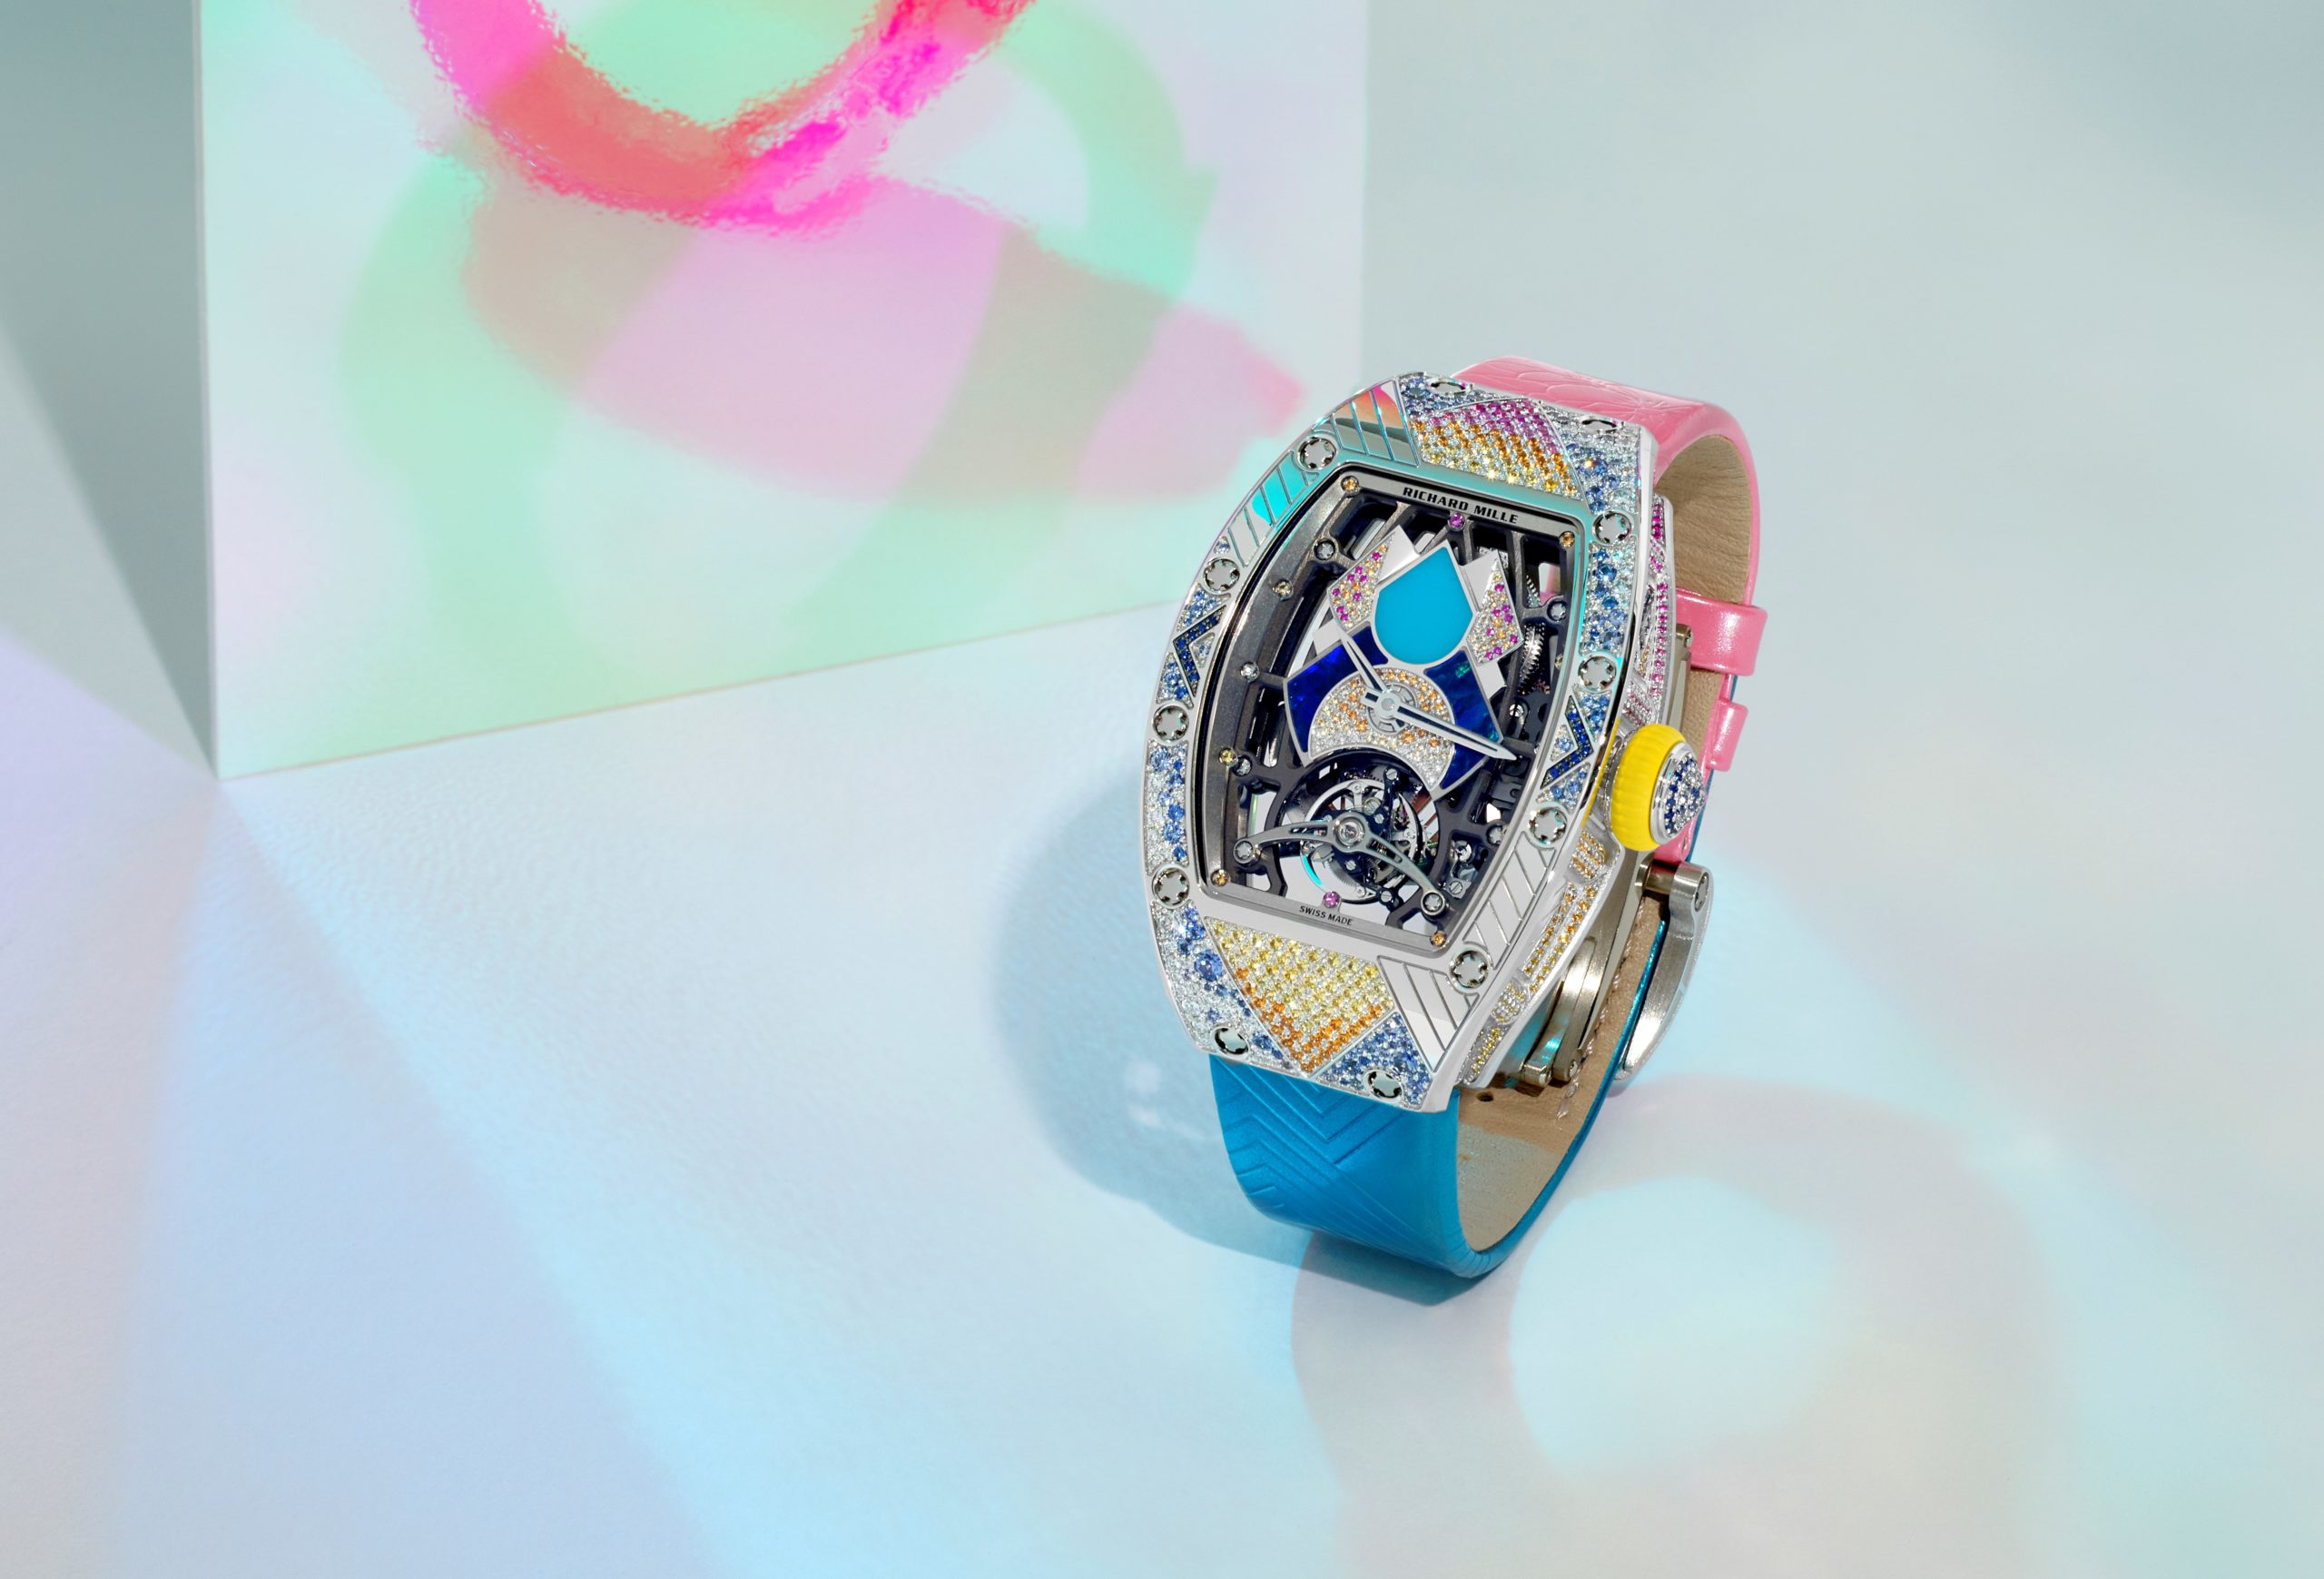 RM 71-02: el reloj inspirado en la Era de la música Disco